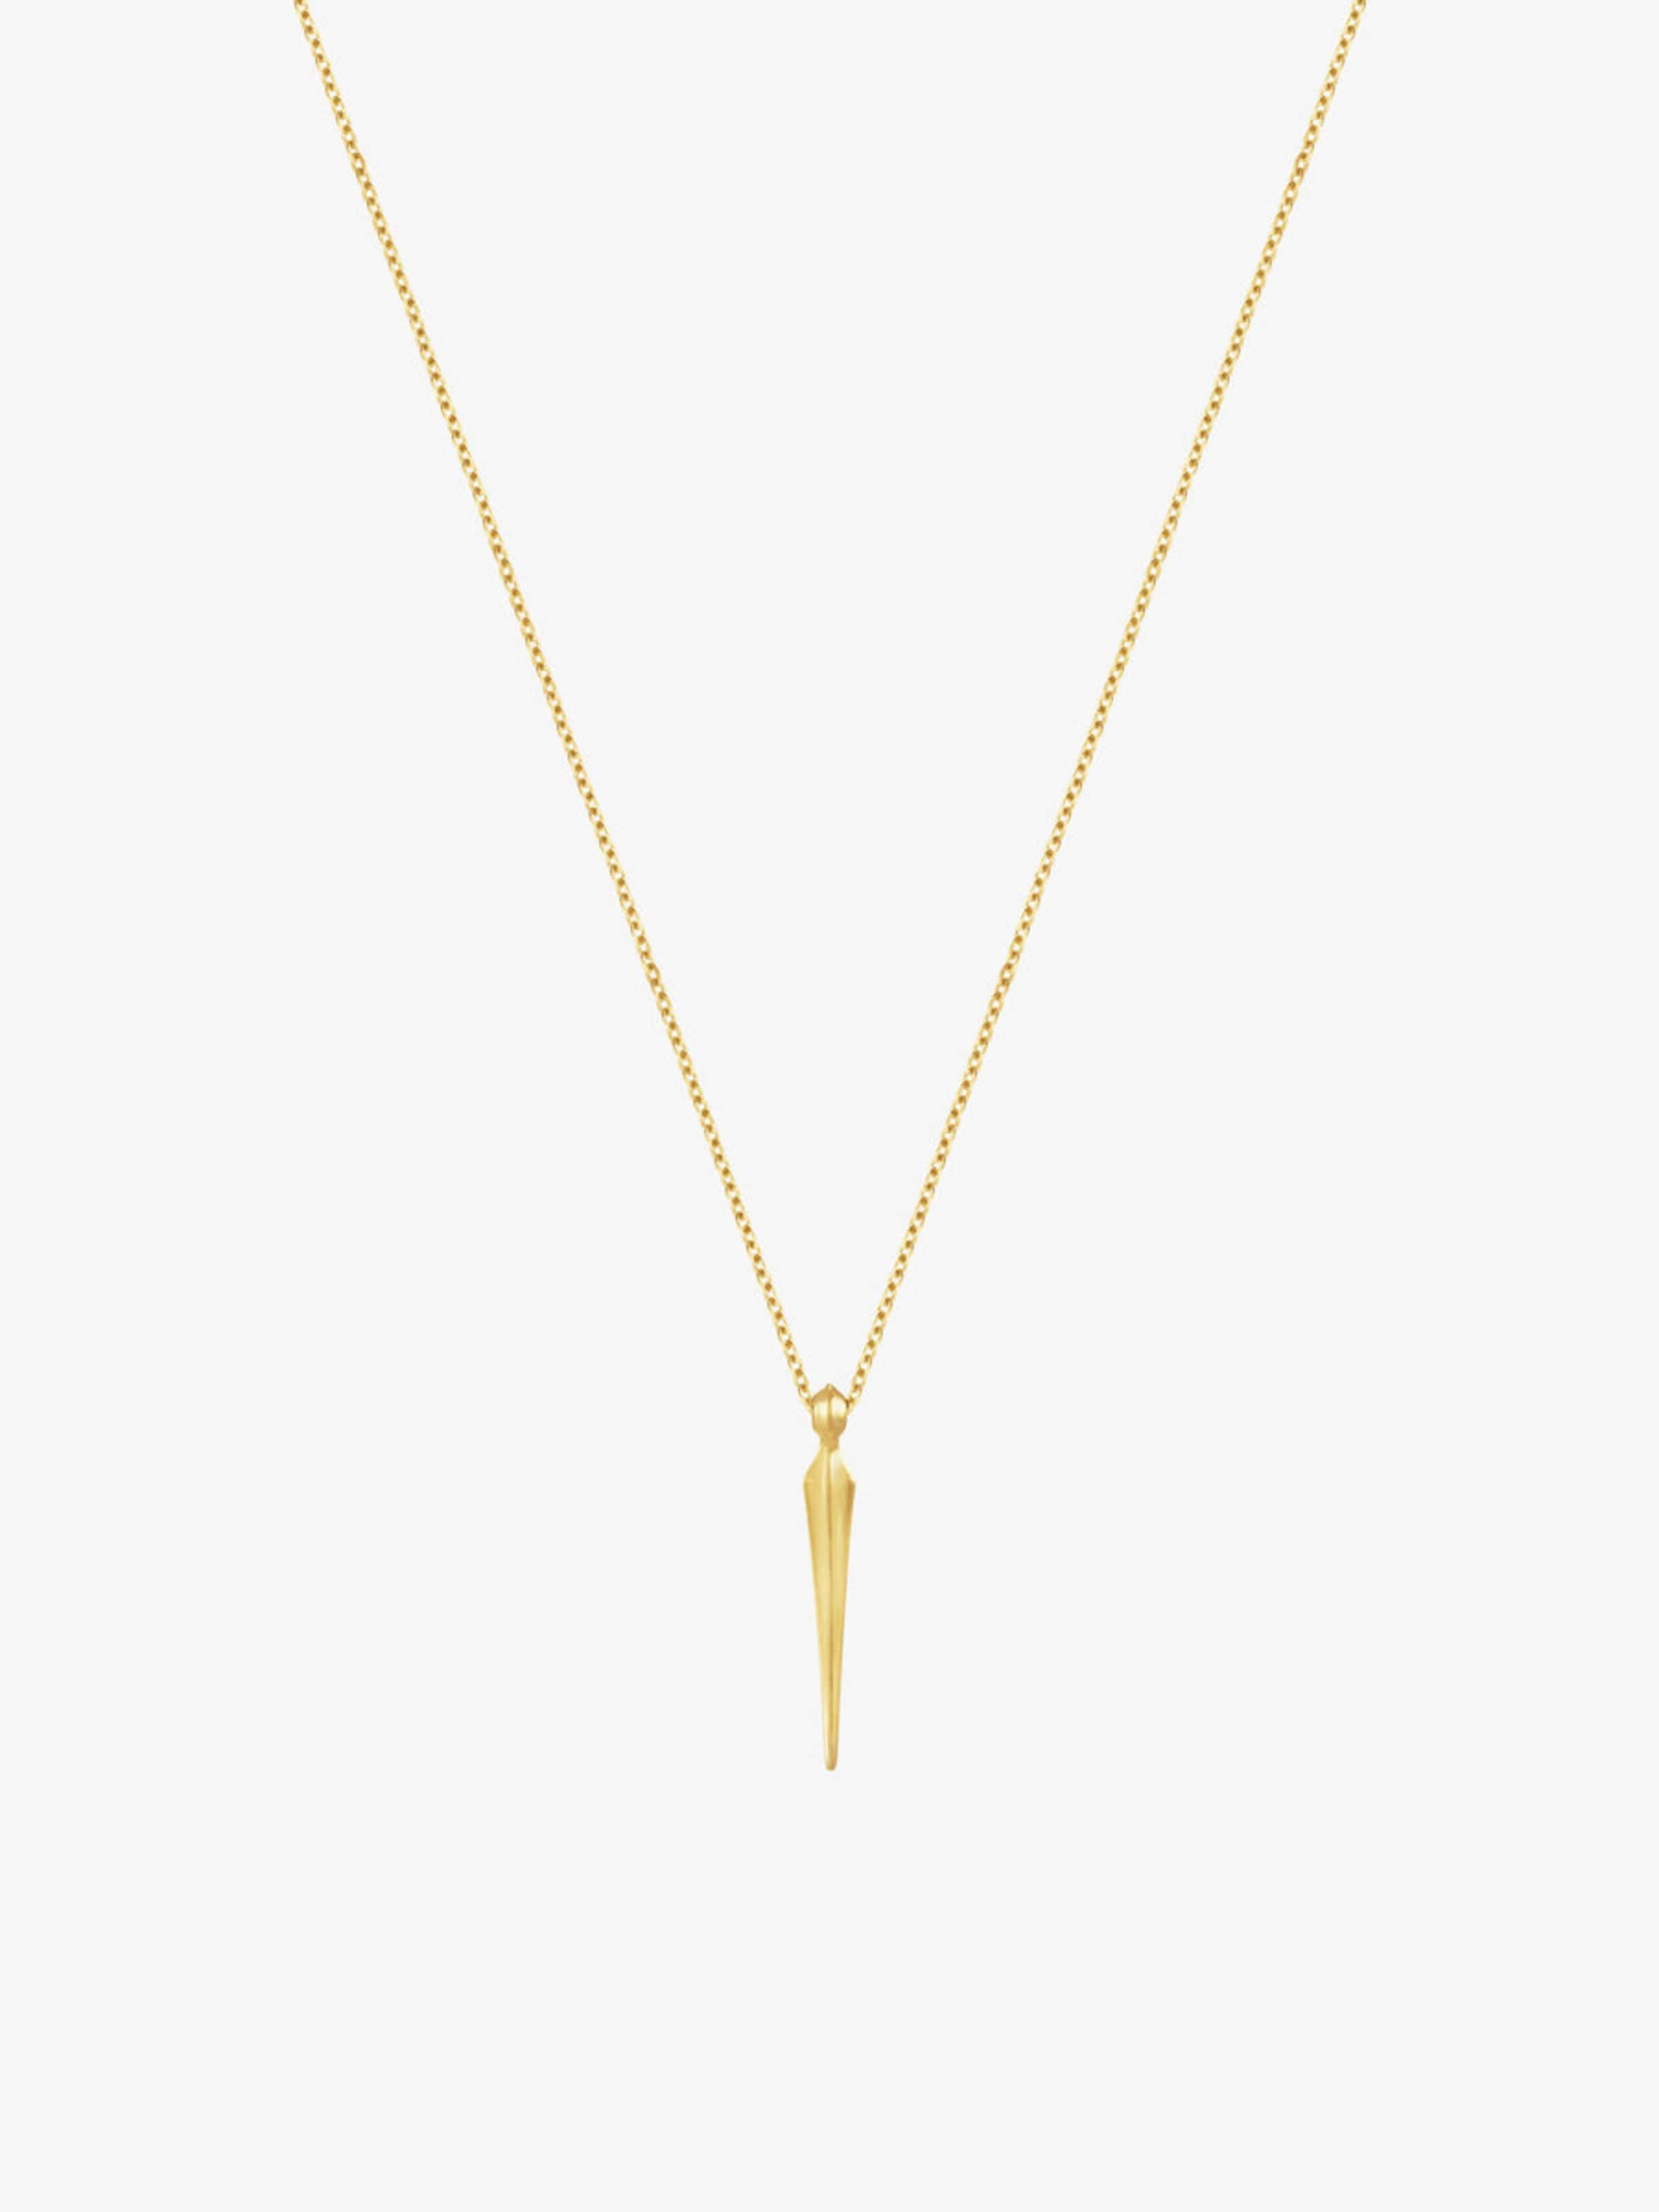 In Id Id In Gold Id Fine Halskette Fine Halskette Gold nOPk08w